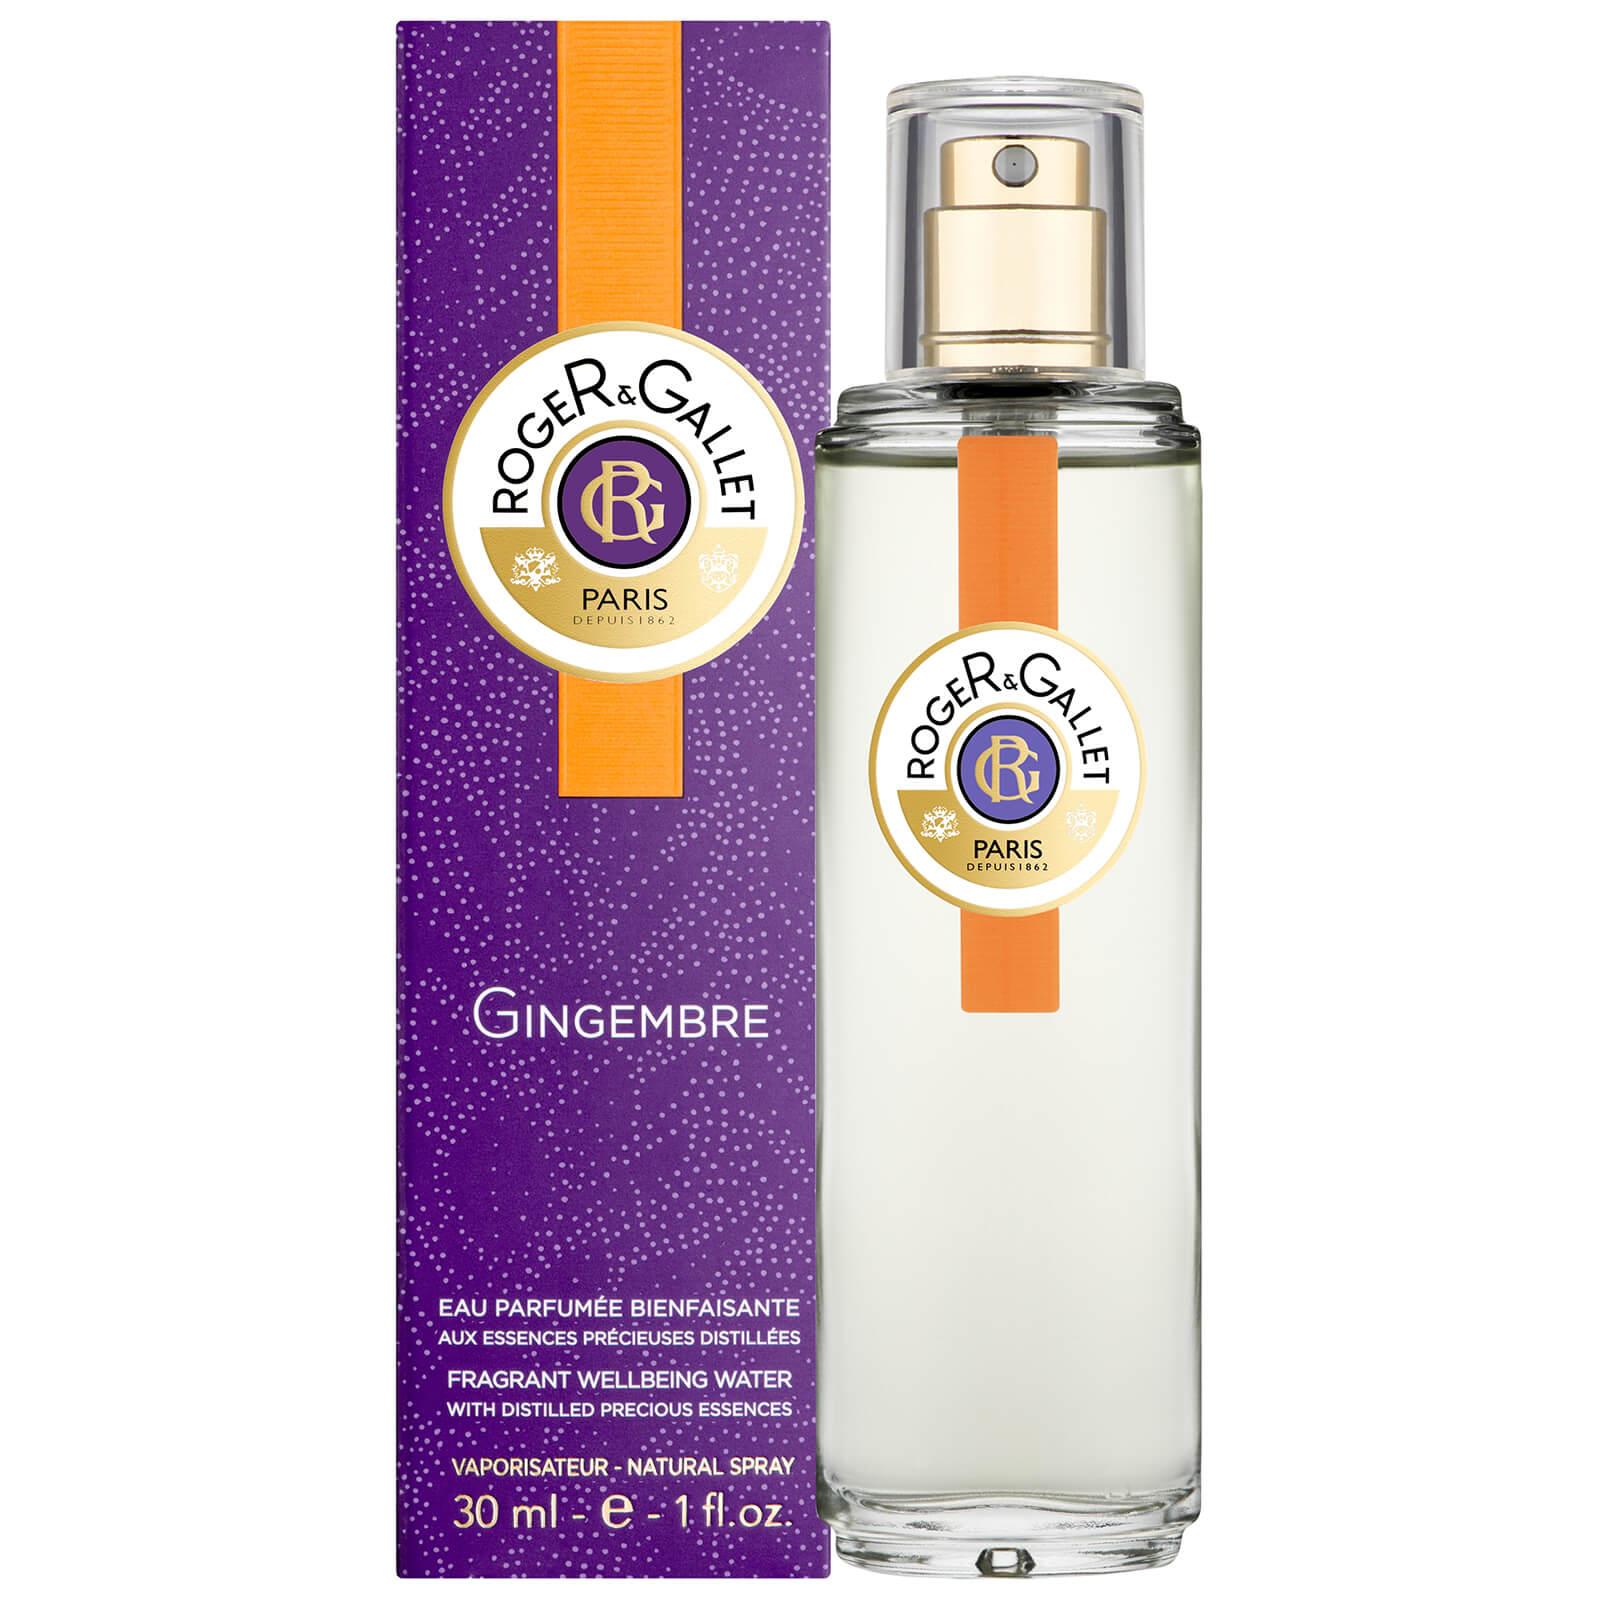 Roger&Gallet Gingembre Eau Fraiche Fragrance 30ml